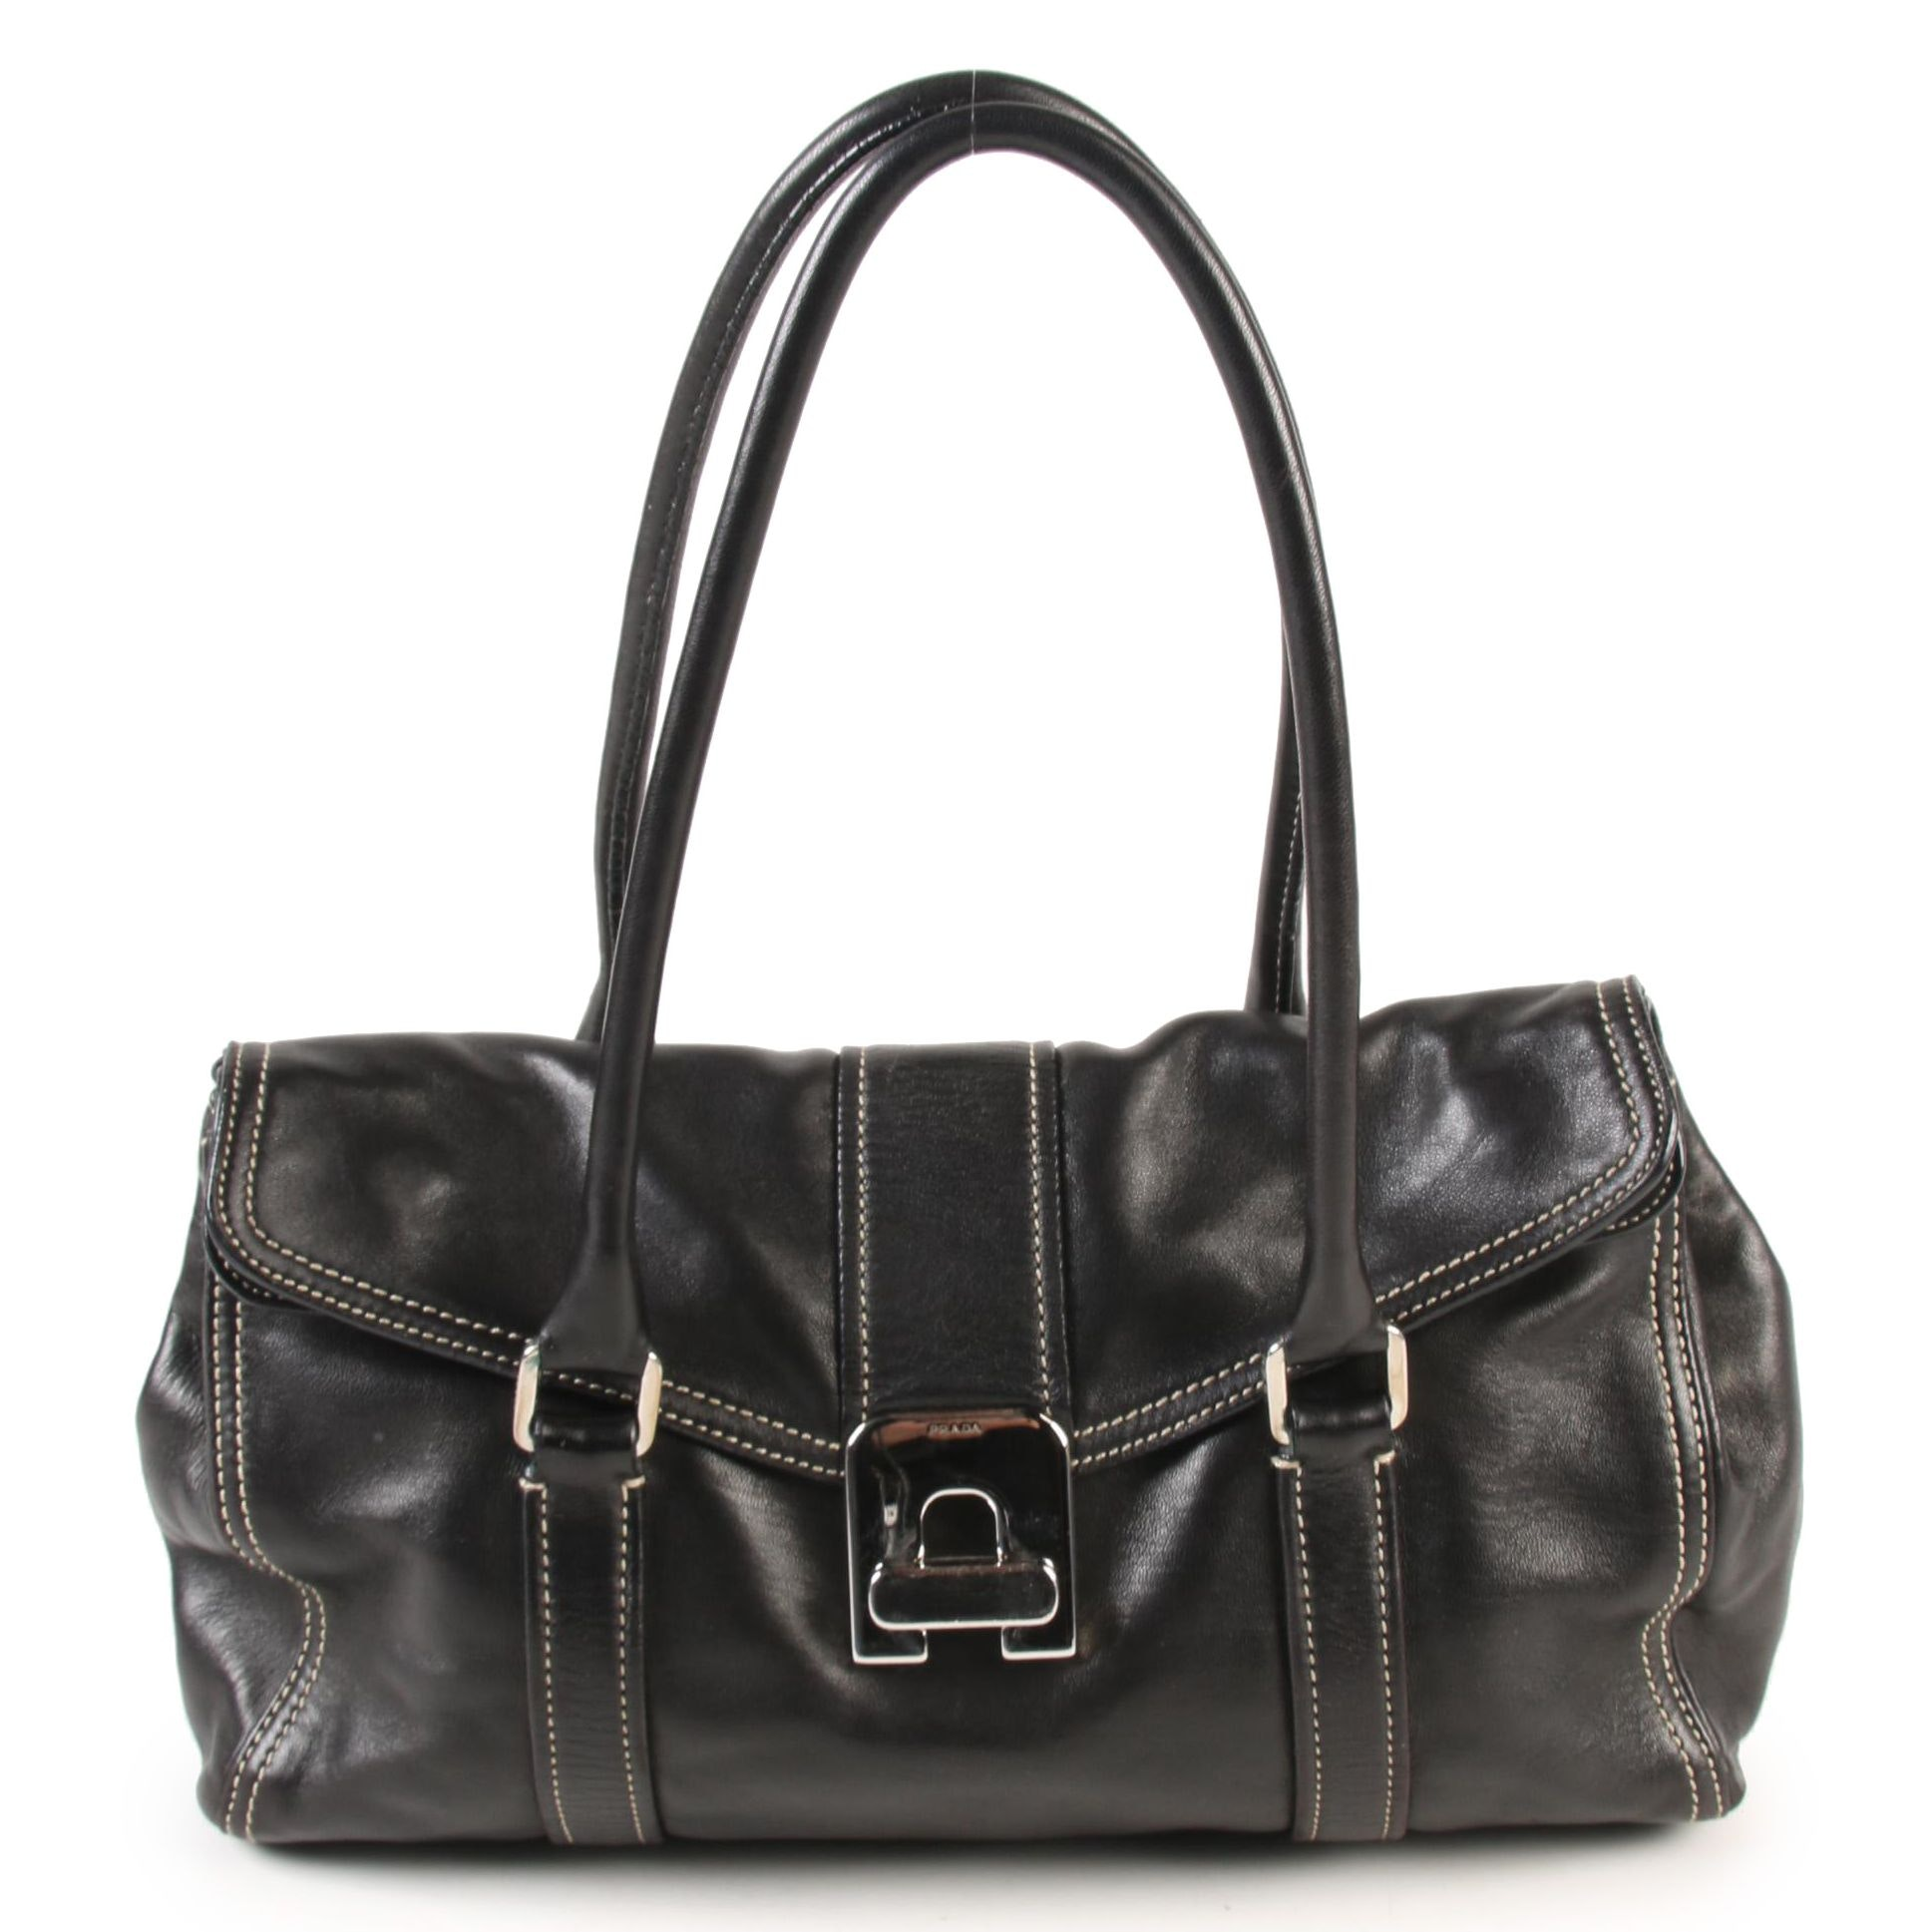 Prada Flap Front Turn Lock Shoulder Bag in Black Leather